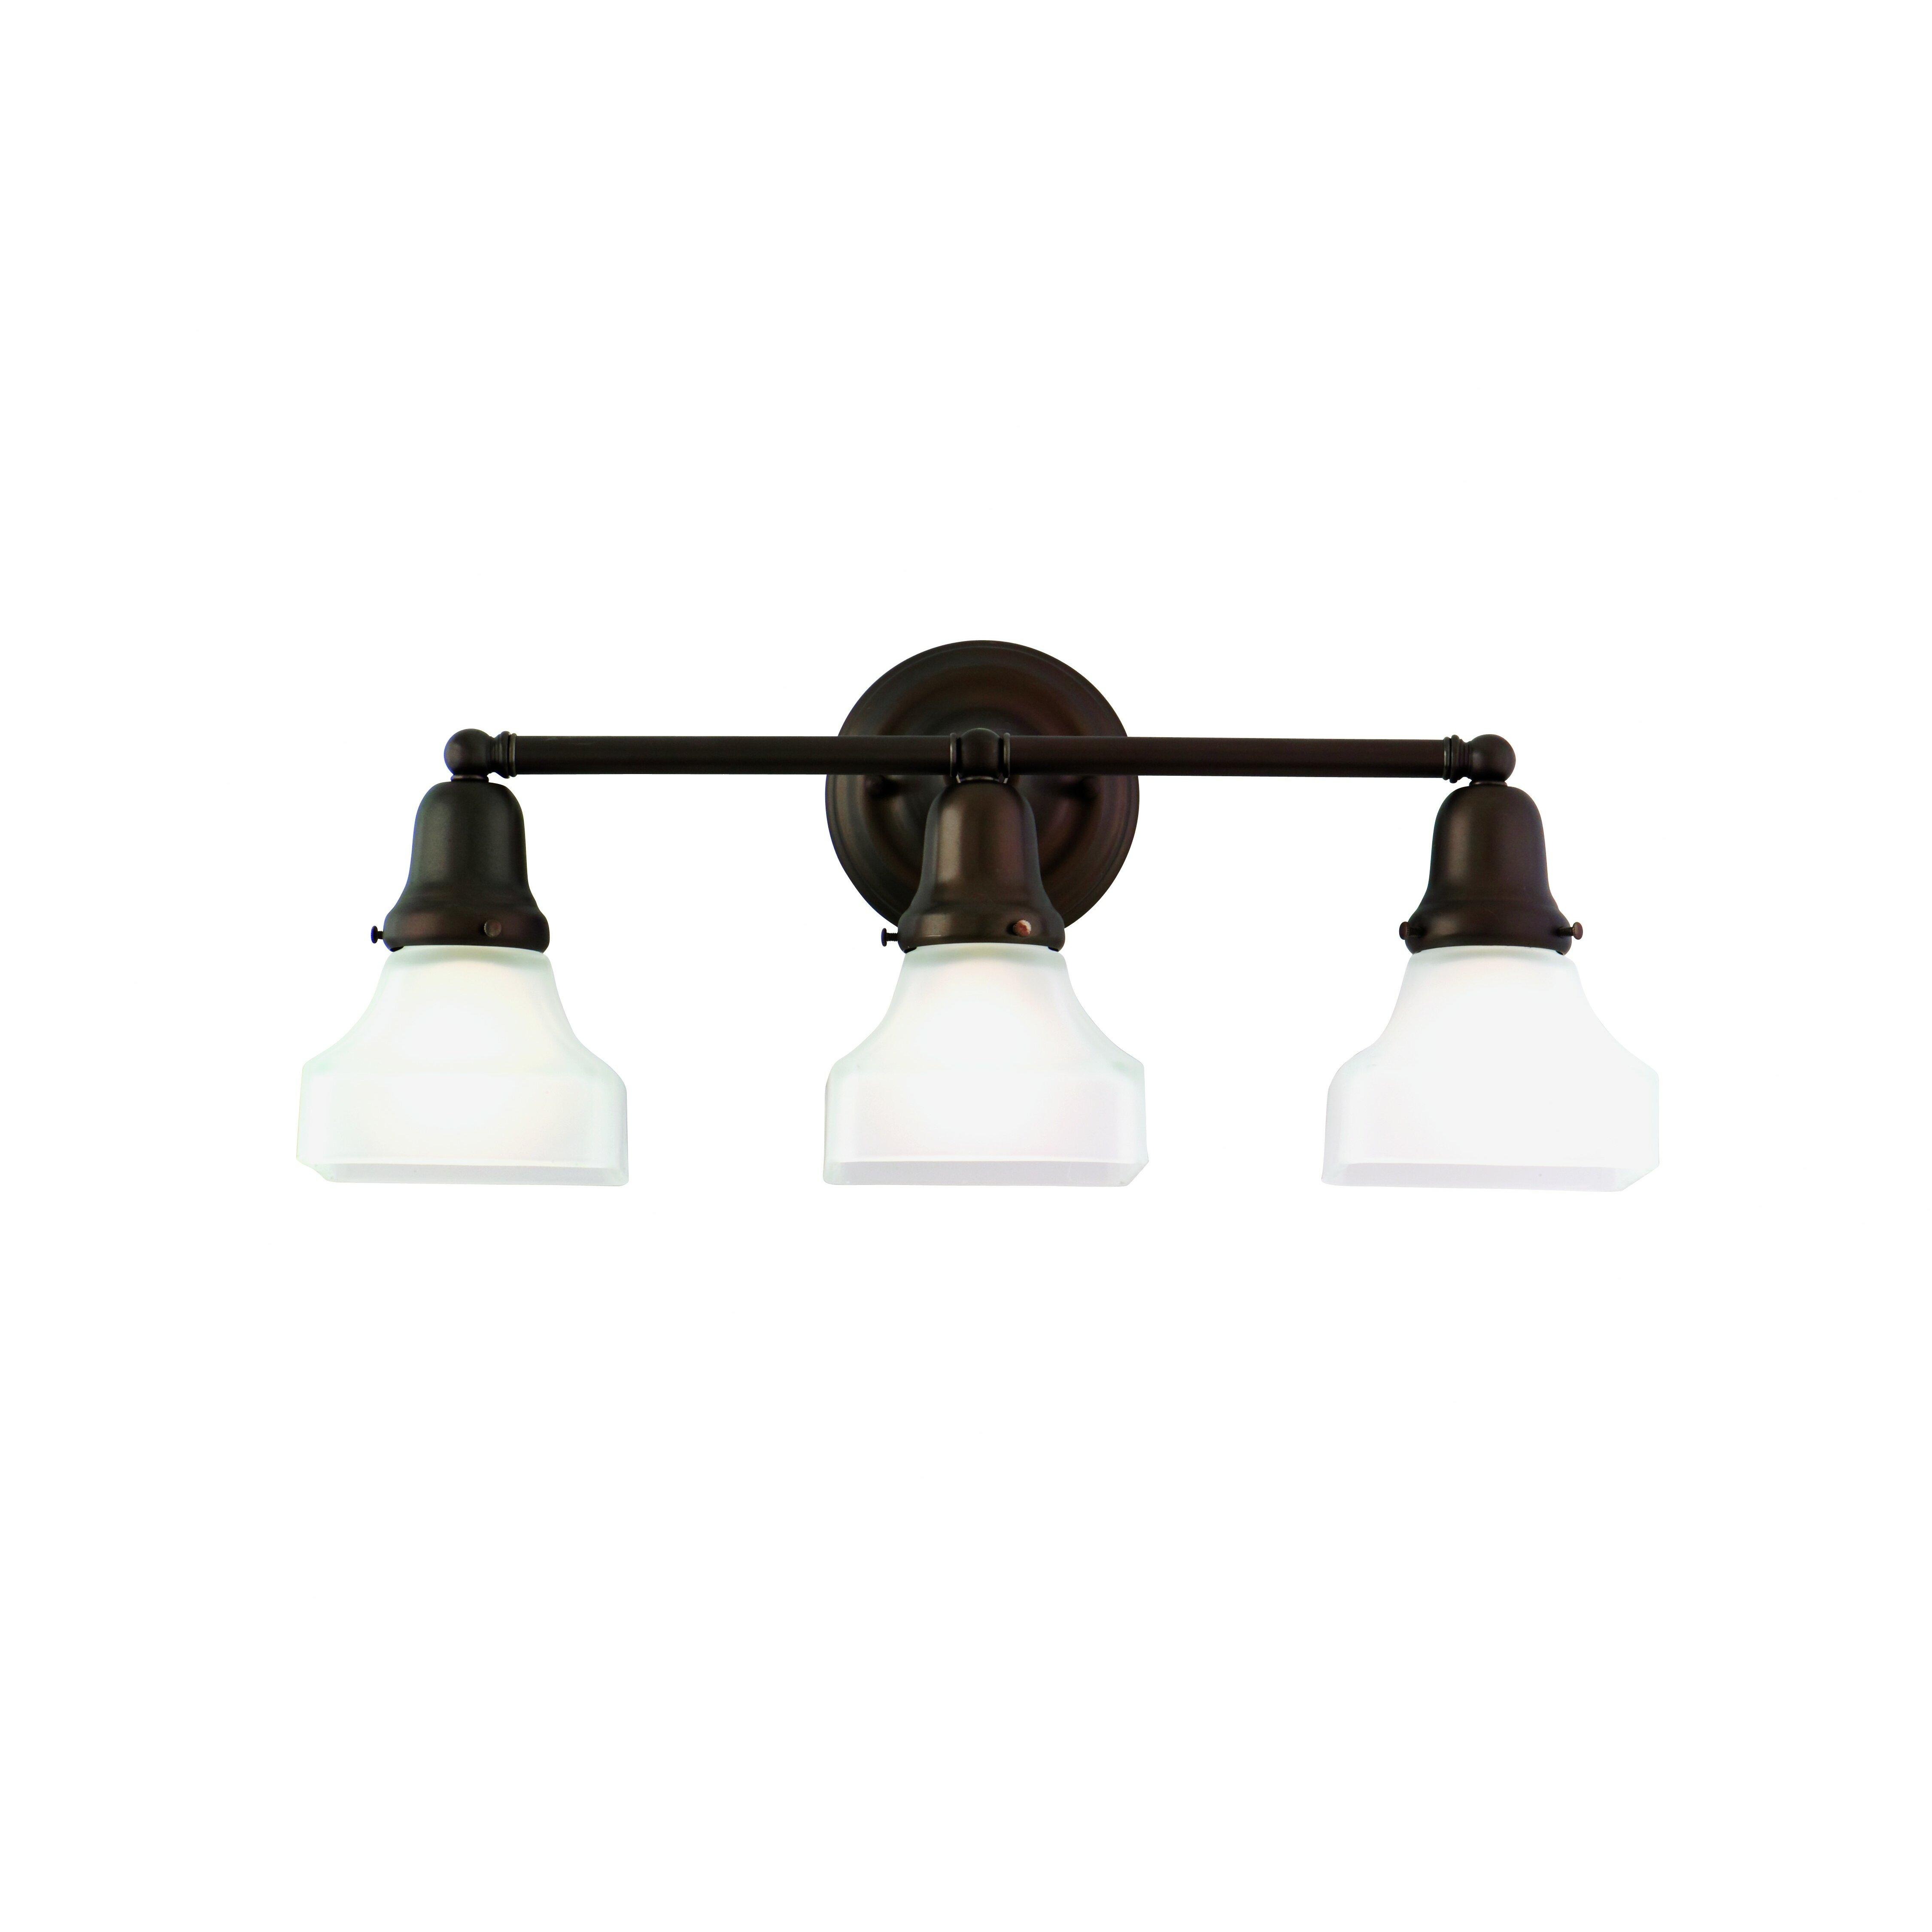 Hudson Valley Bath Vanity Lighting: Hudson Valley Lighting Edison 3 Light Bath Vanity